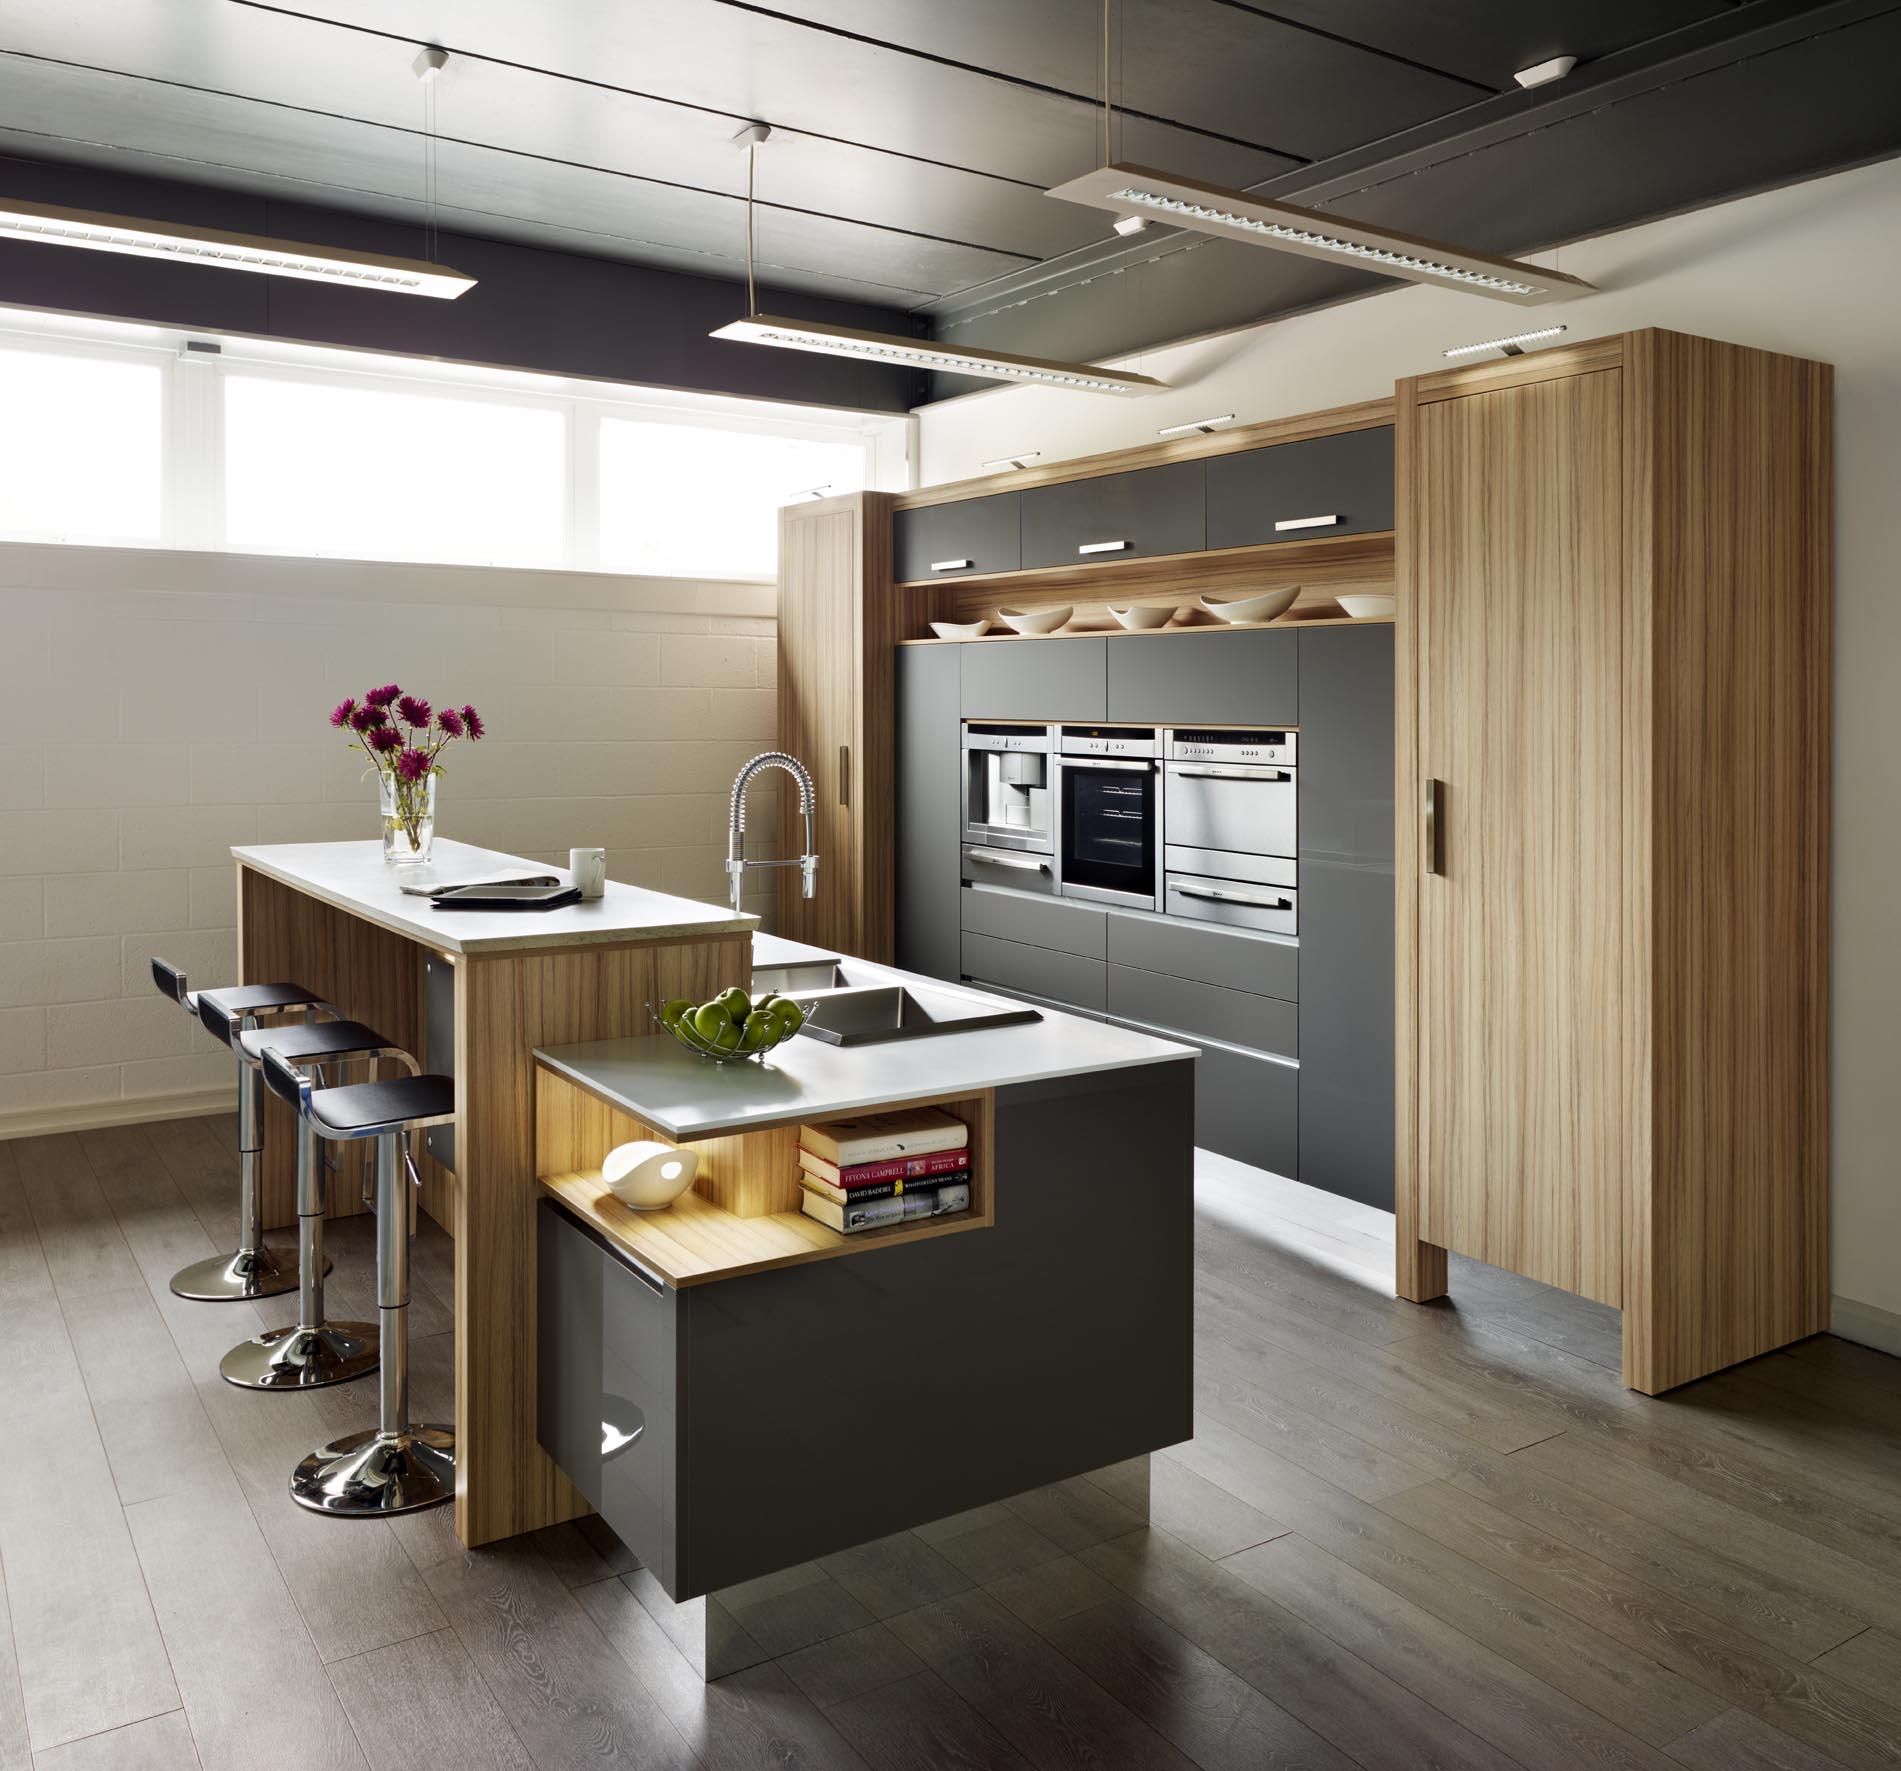 See Our Designer Kitchen Range